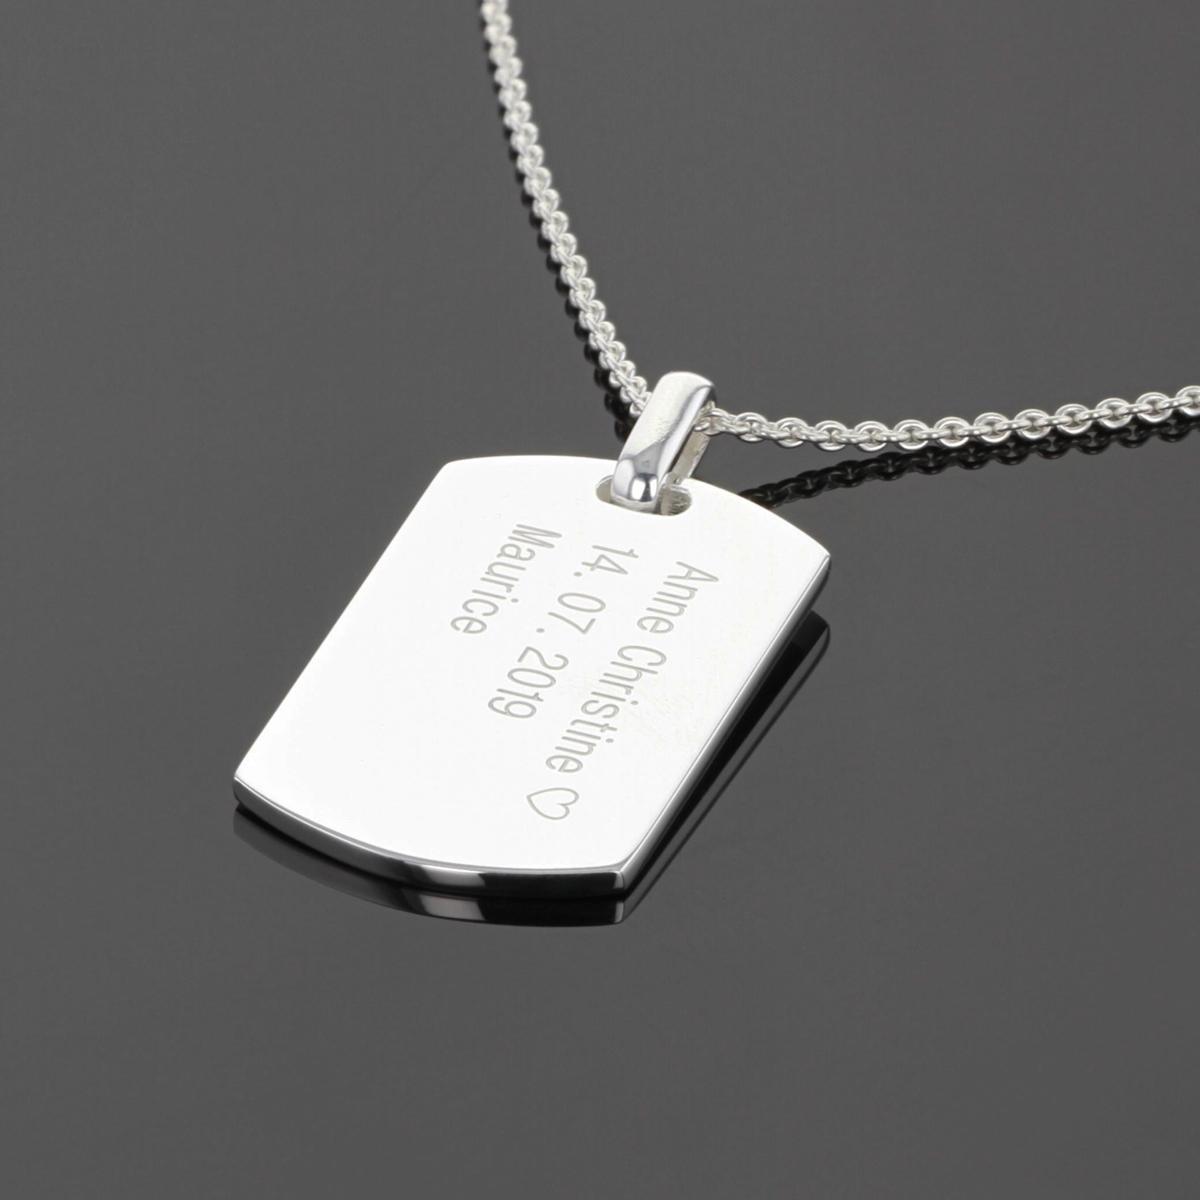 Silver dog tag pendant